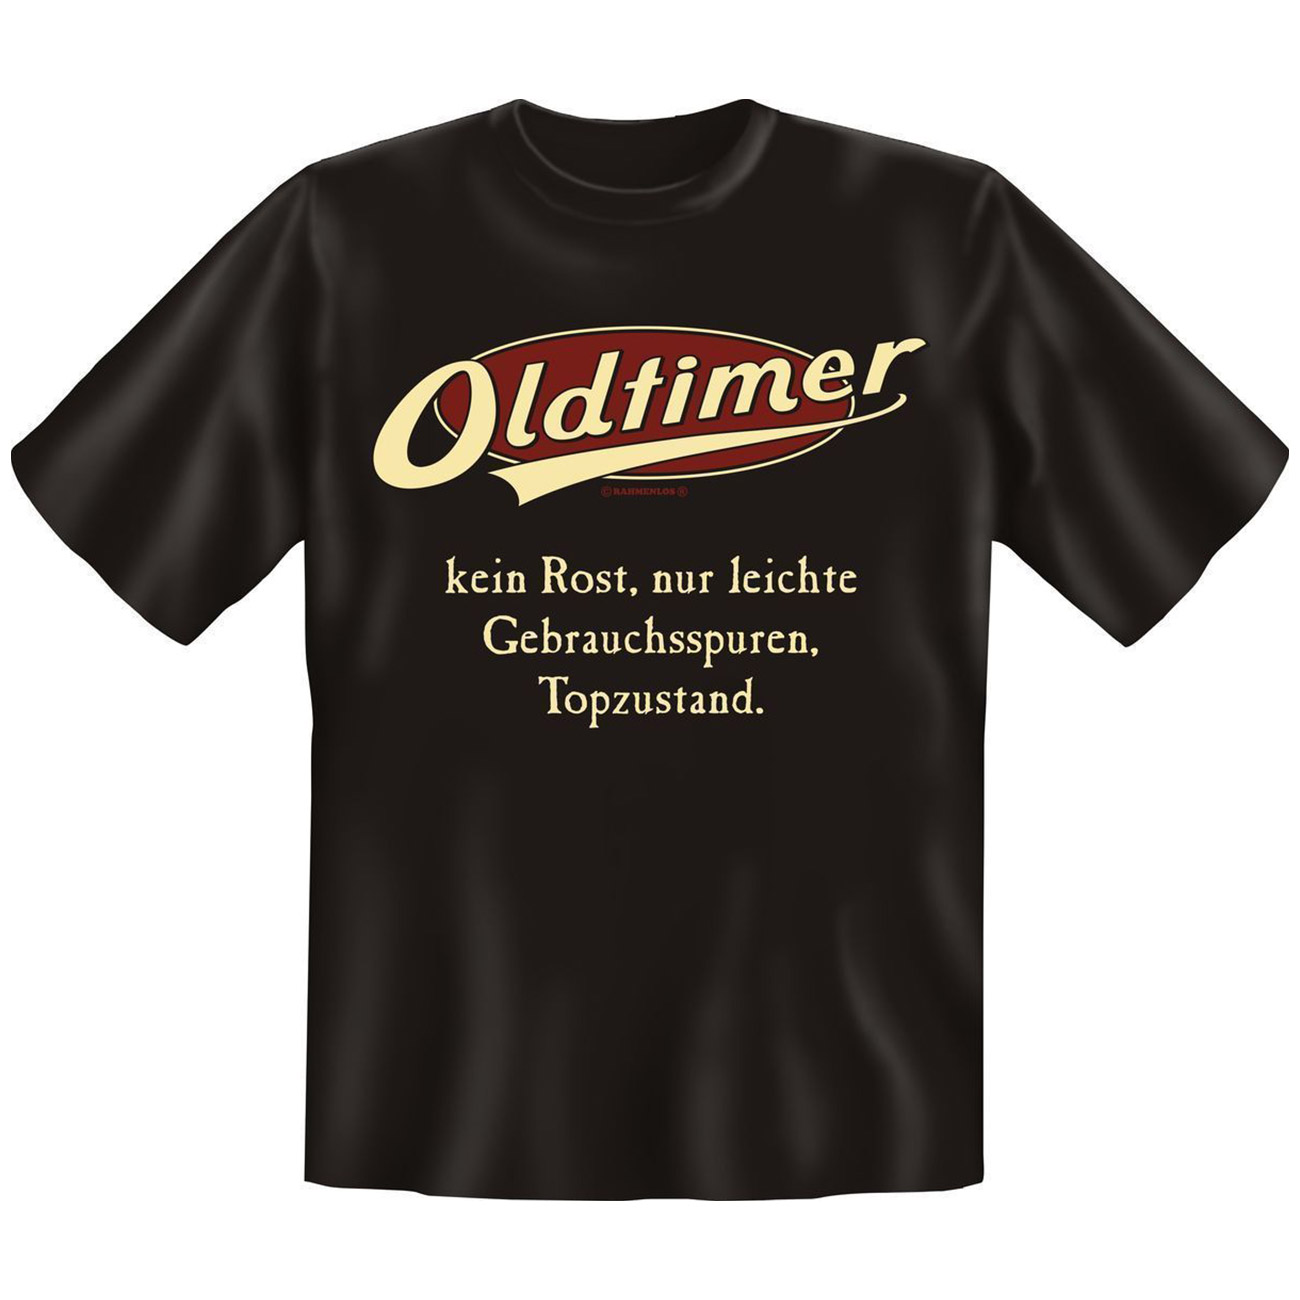 f64b54612b9af9 Rahmenlos T-Shirt Oldtimer Retro günstig kaufen - Kotte & Zeller